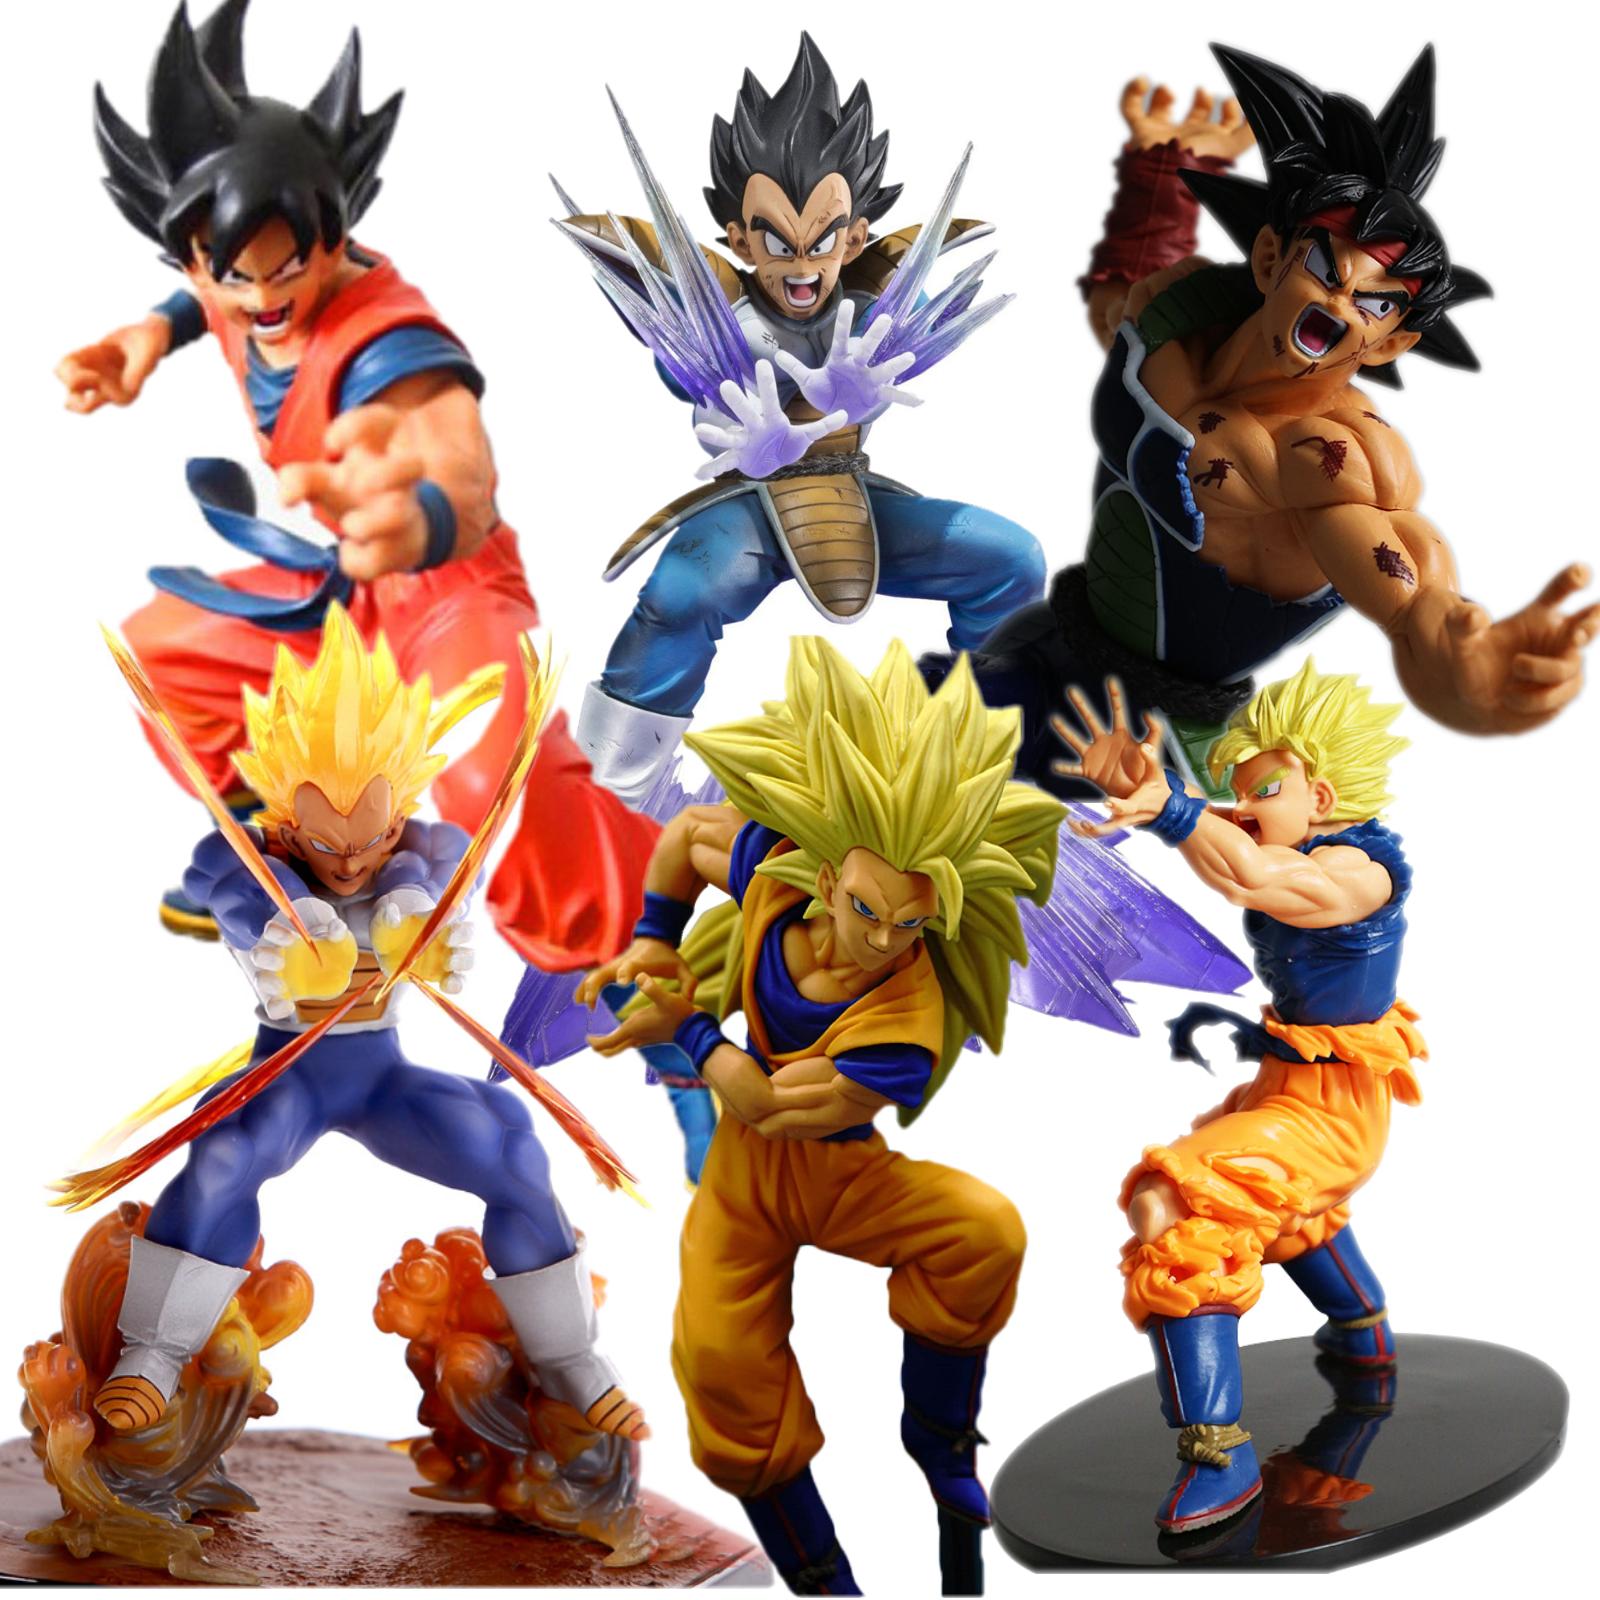 Dragon Ball Z Super Saiyan Son Goku Vegeta Trunks Action Figure Collection Giocattoli Bambola Figura Robot Kit Blocco di Nuovo in box